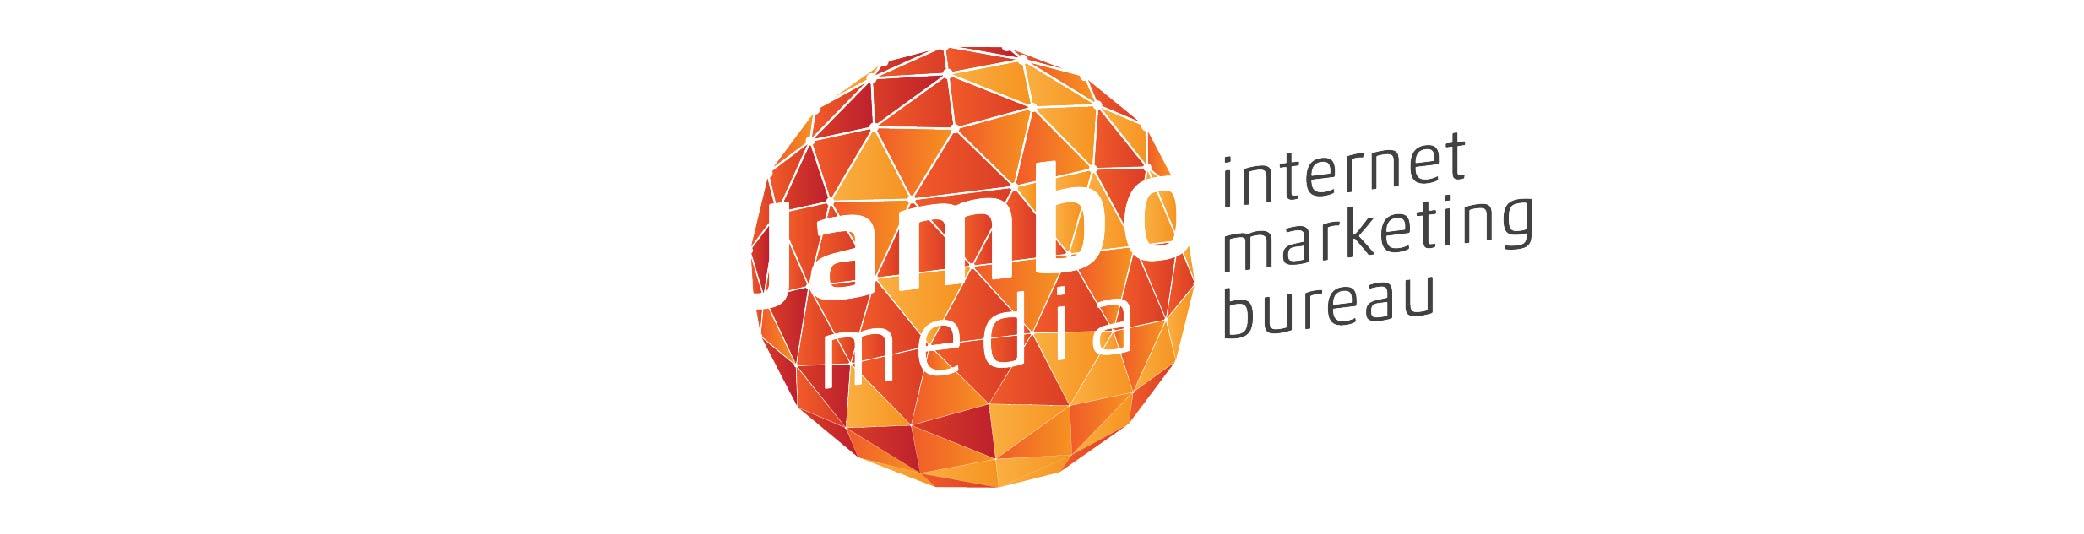 Jambo Media image